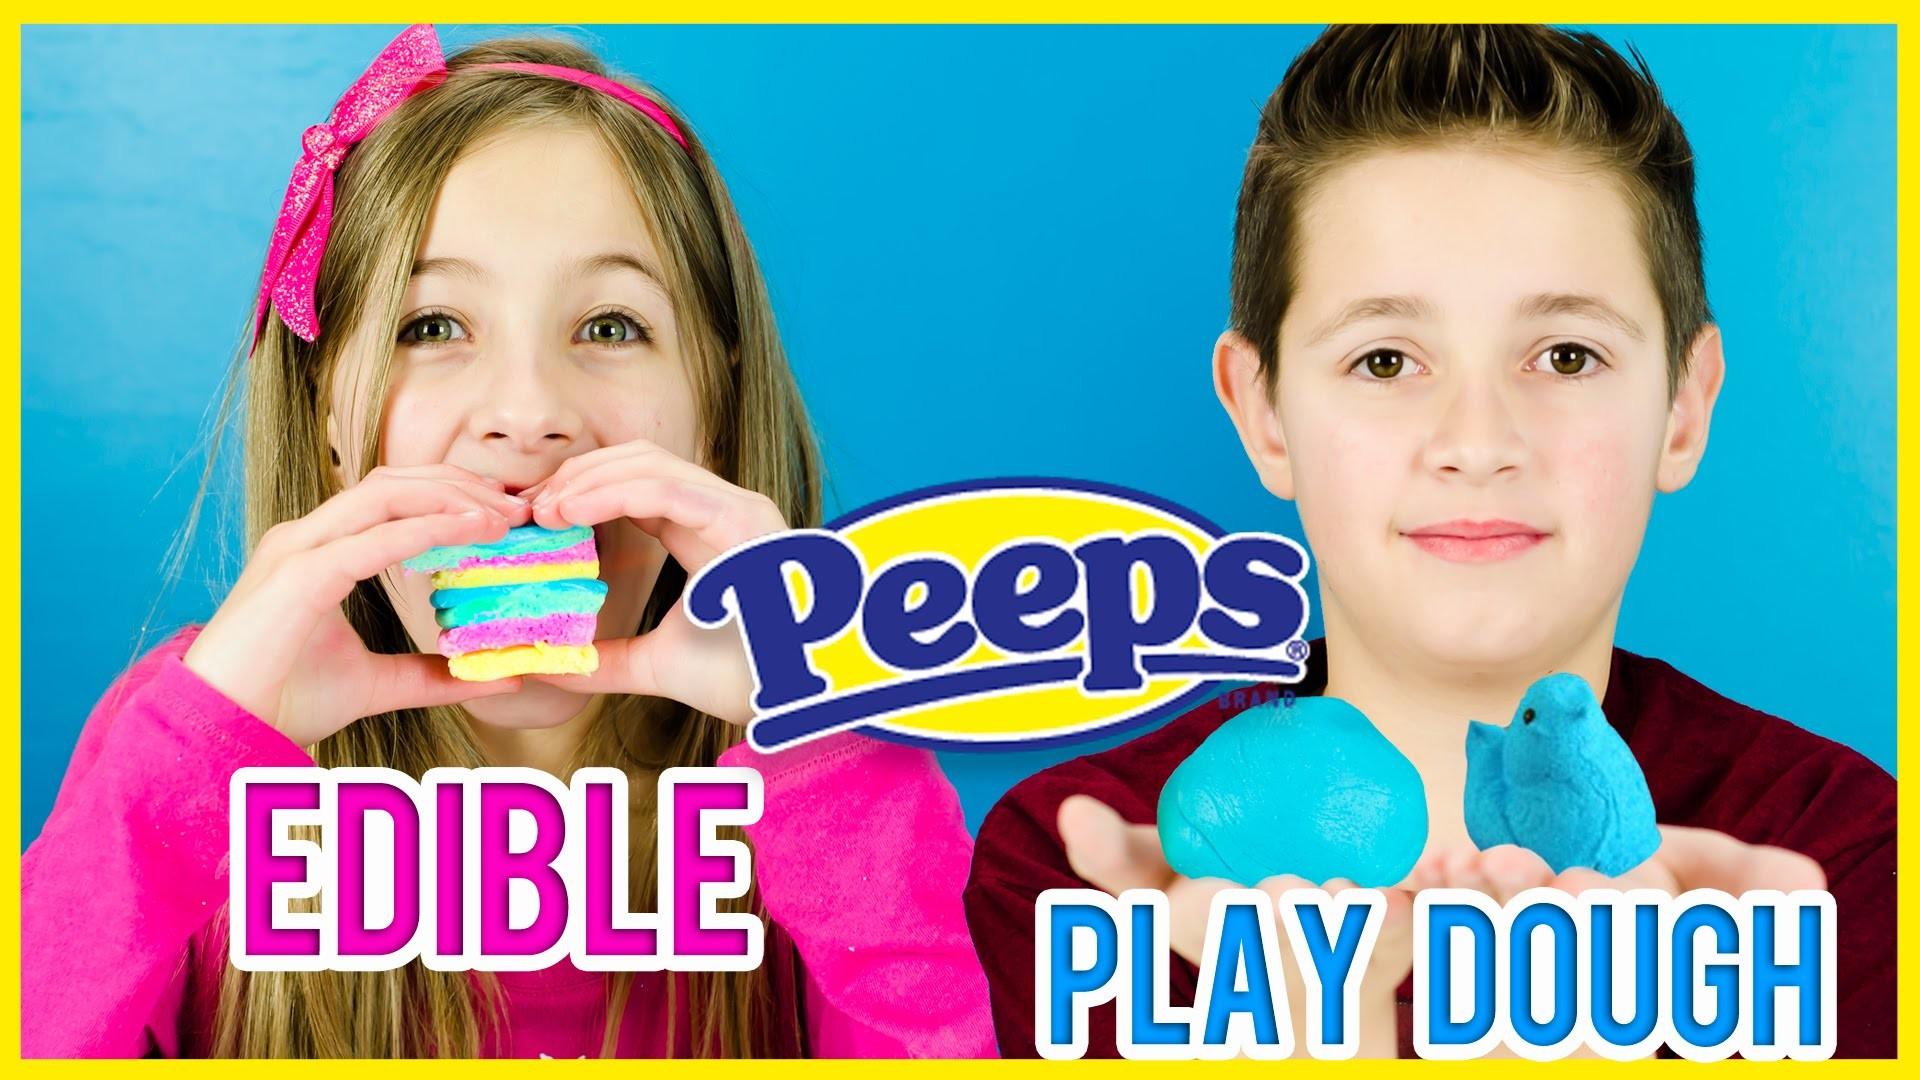 EDIBLE PEEPS PLAY DOUGH! PINTEREST DIY RECIPE TEST! HOW TO MAKE EDIBLE PLAY-DOH WITH PEEPS